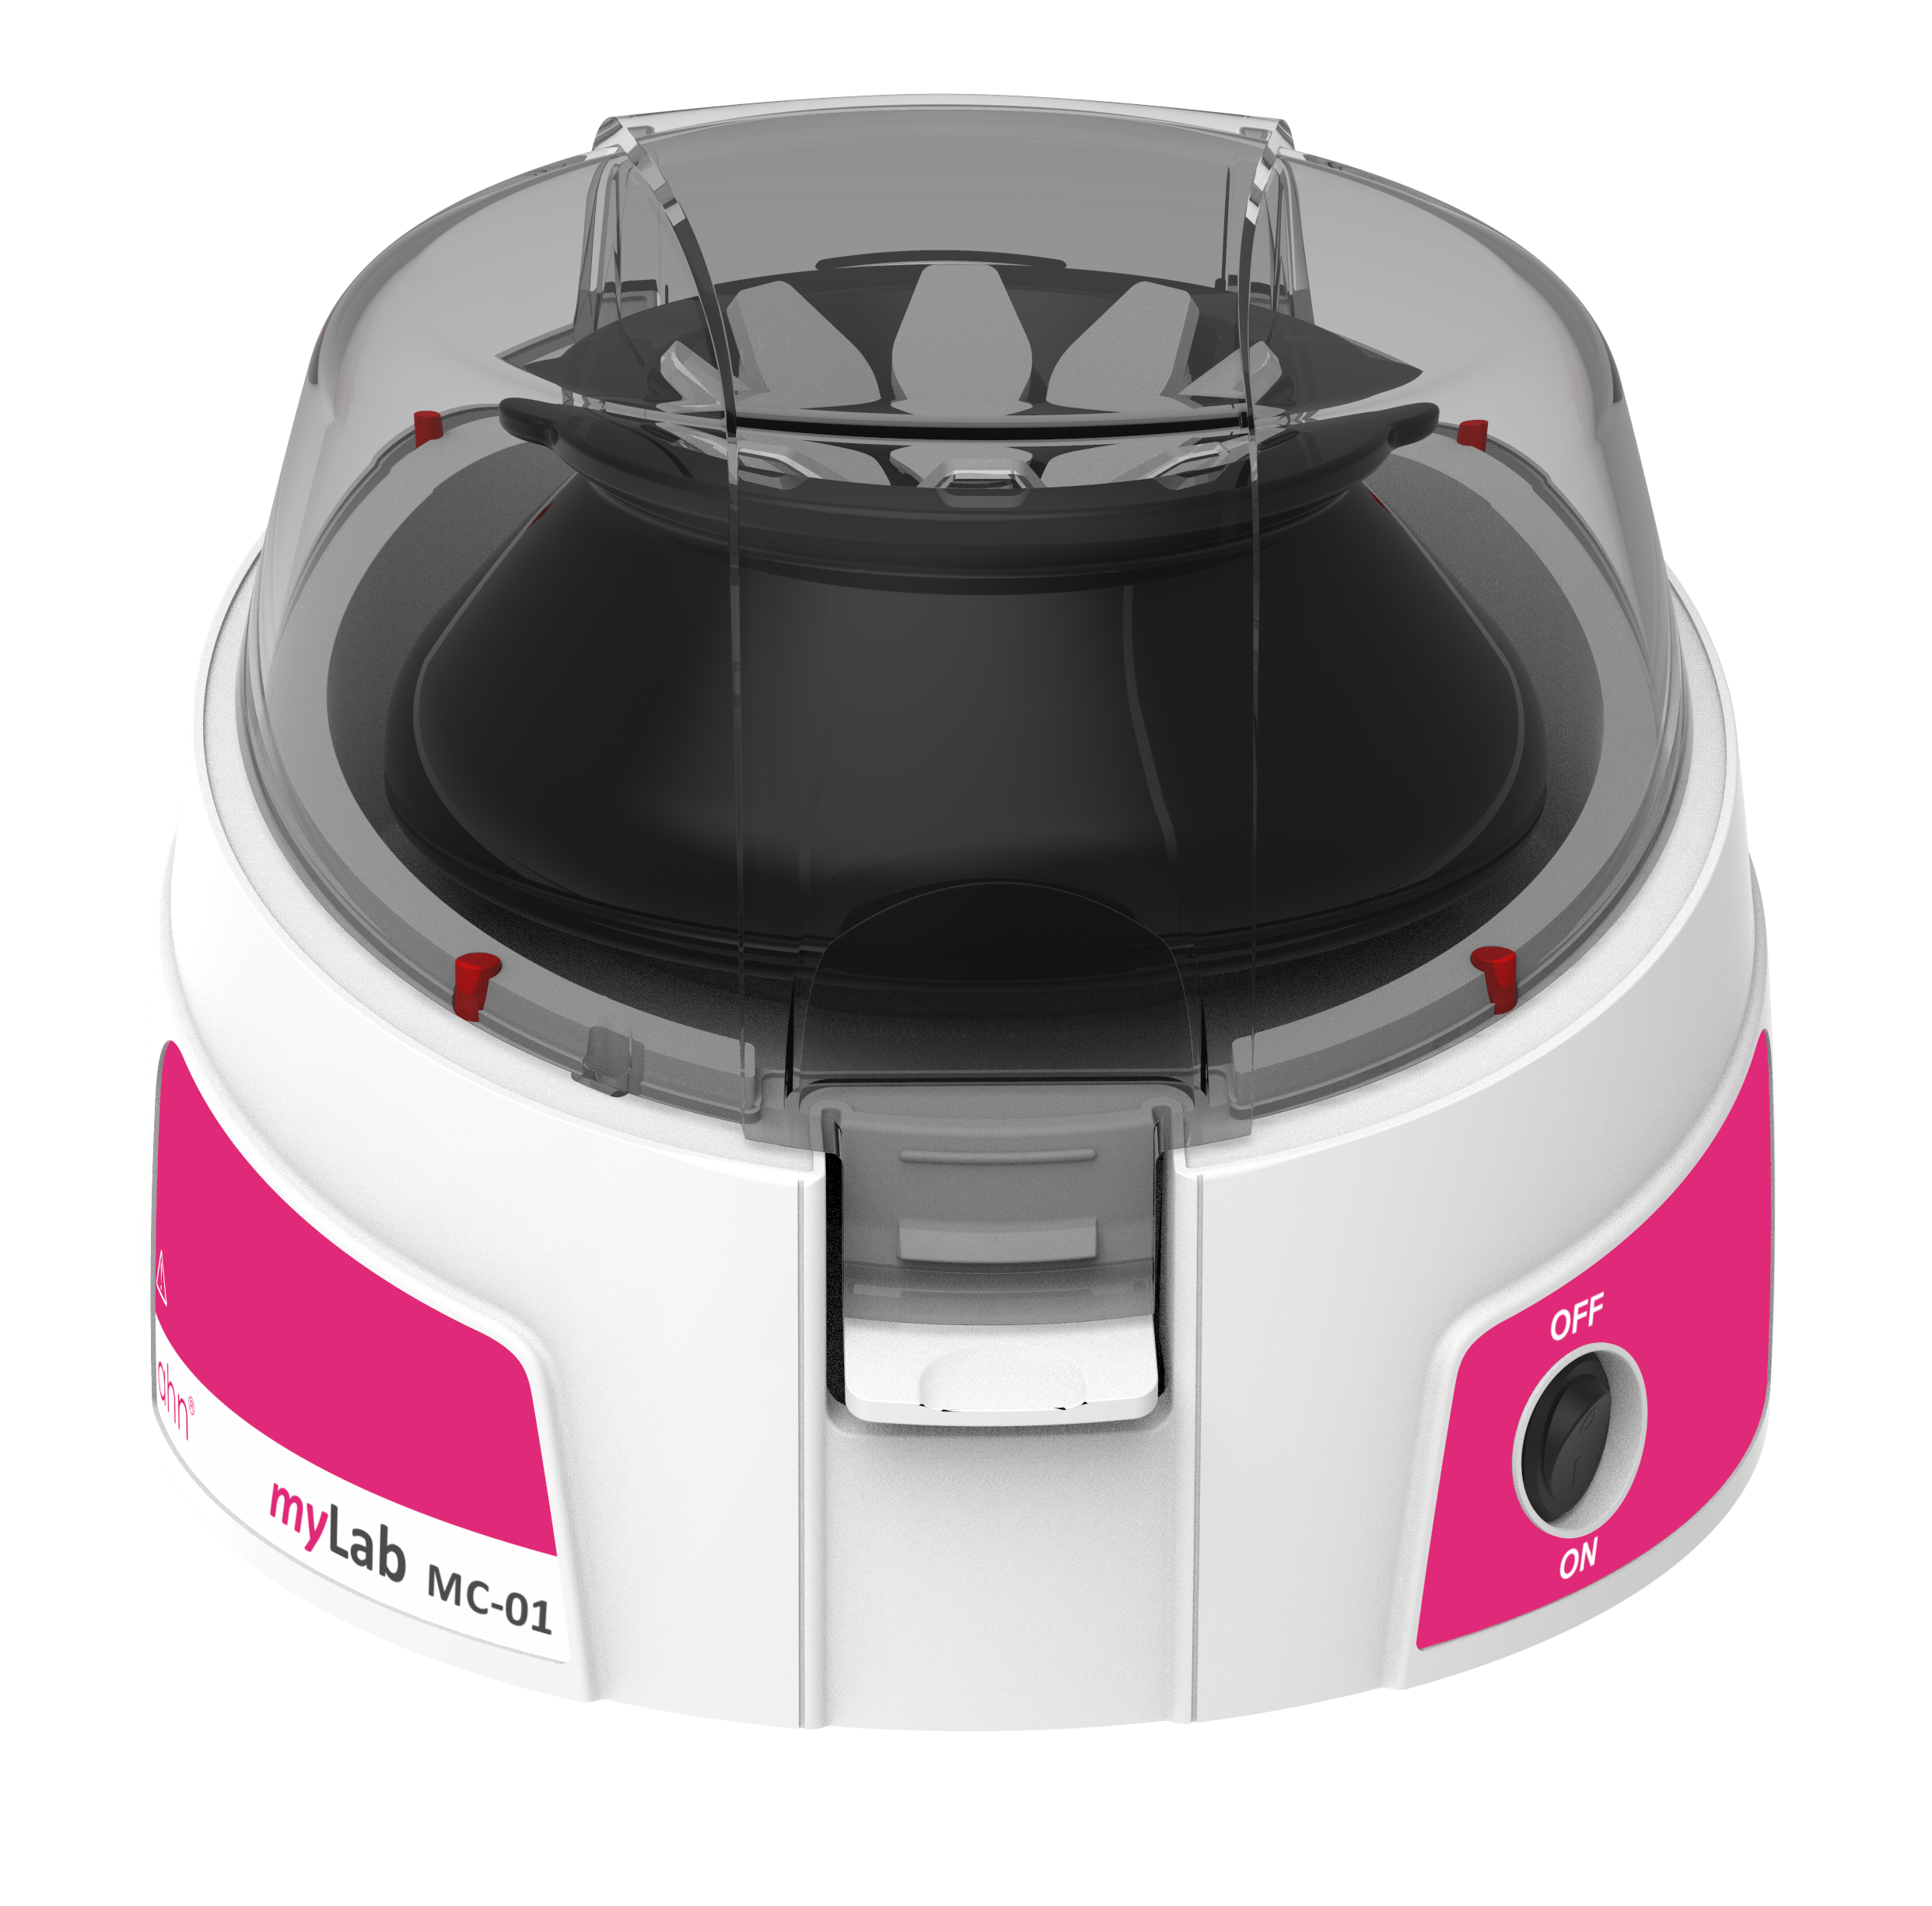 centrifuge 6000 rpm centrifuge 2000 g mylab centrifuge 6000 rpm